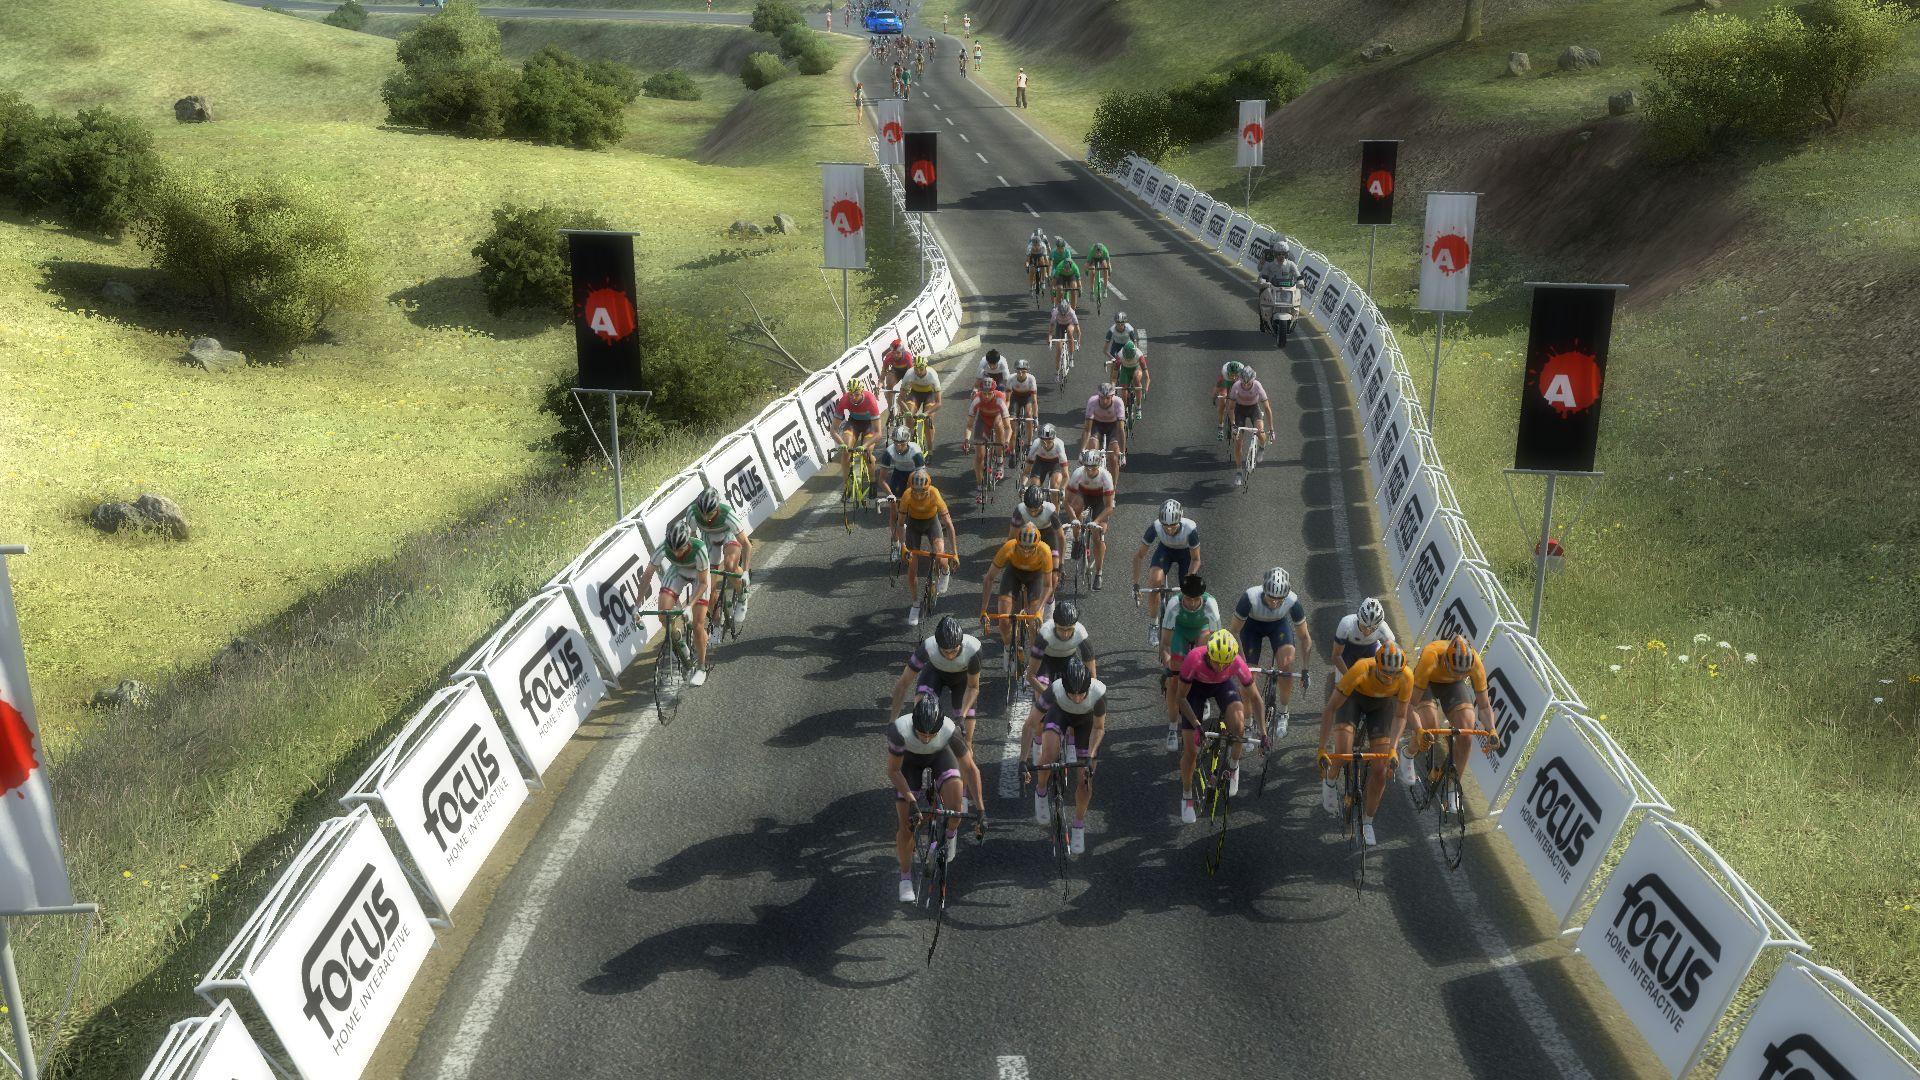 pcmdaily.com/images/mg/2019/Races/C2/Gisborne/Gisborne%2012.jpg